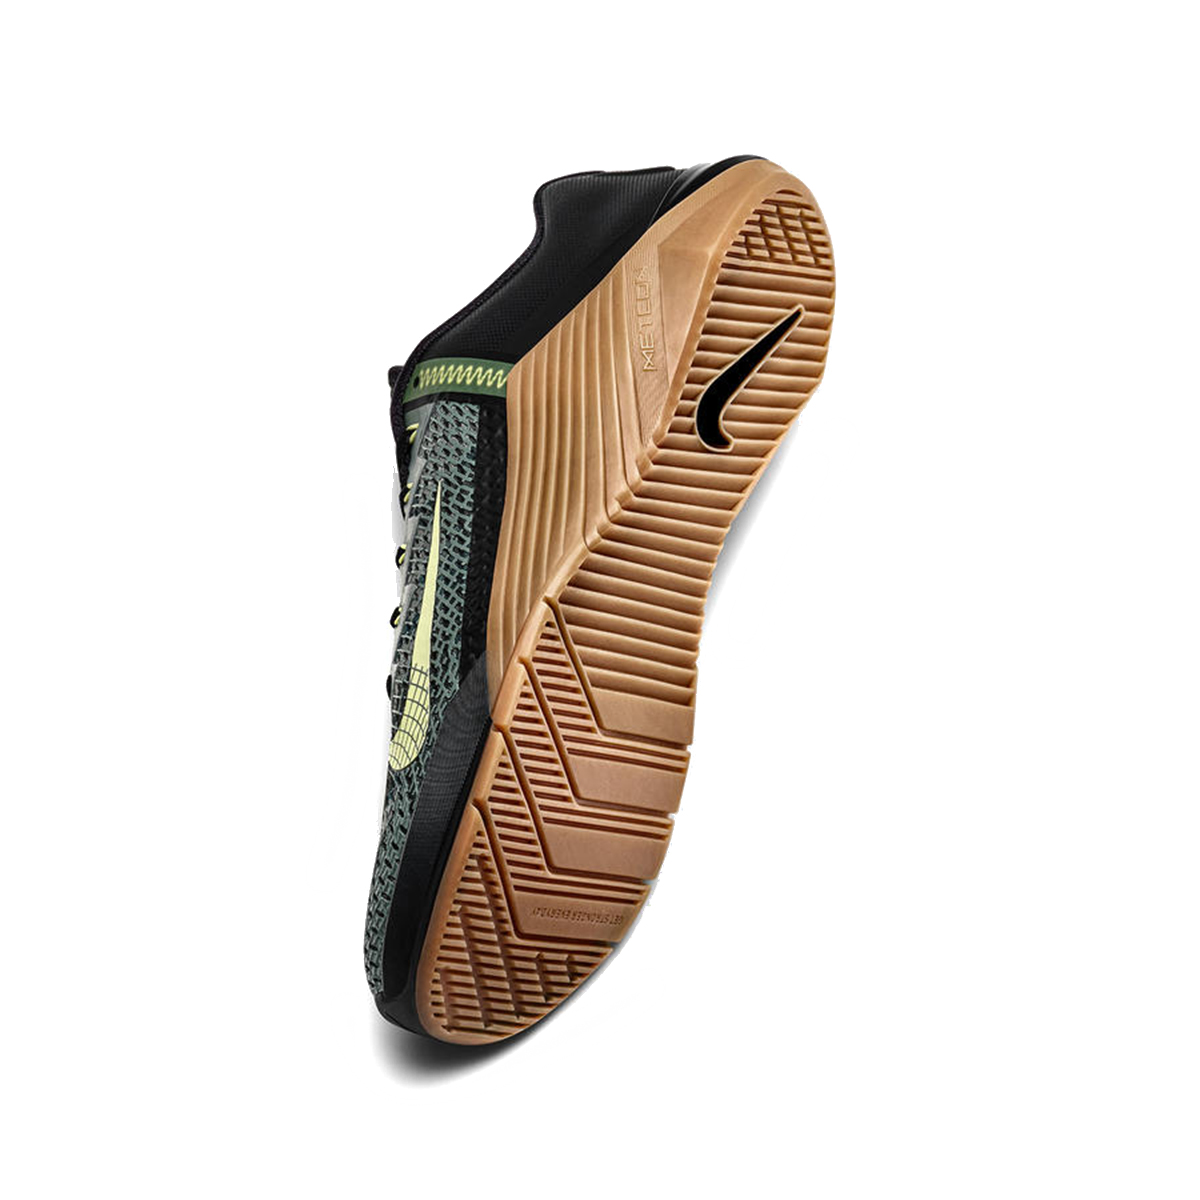 Men's Nike Metcon 6 Training Shoes - Color: Valerian Blue - Size: 3.5 - Width: Regular, Valerian Blue, large, image 3